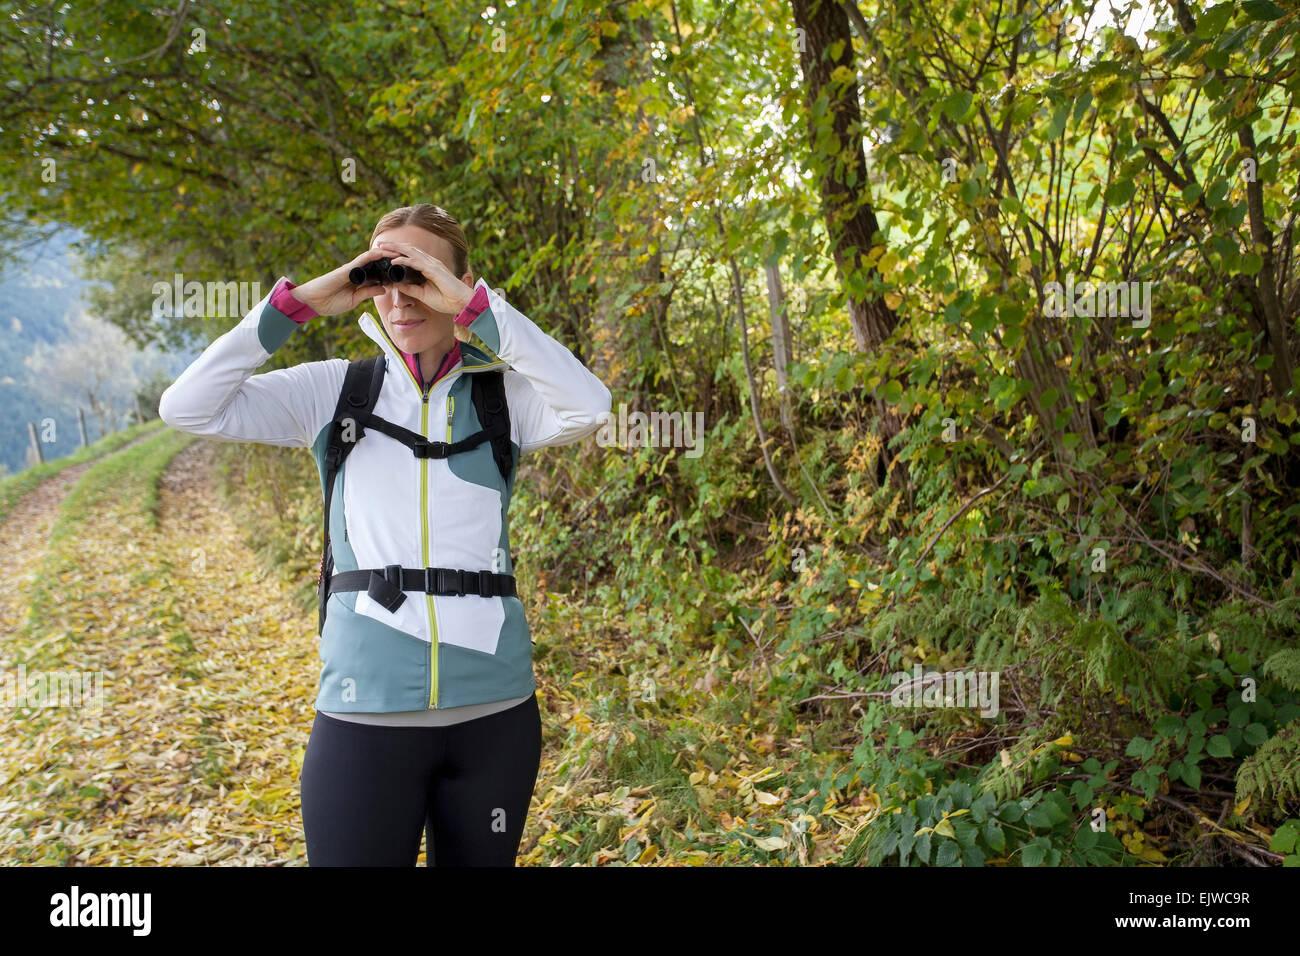 Austria, Salzburger Land, Maria Alm, Woman looking through binoculars - Stock Image